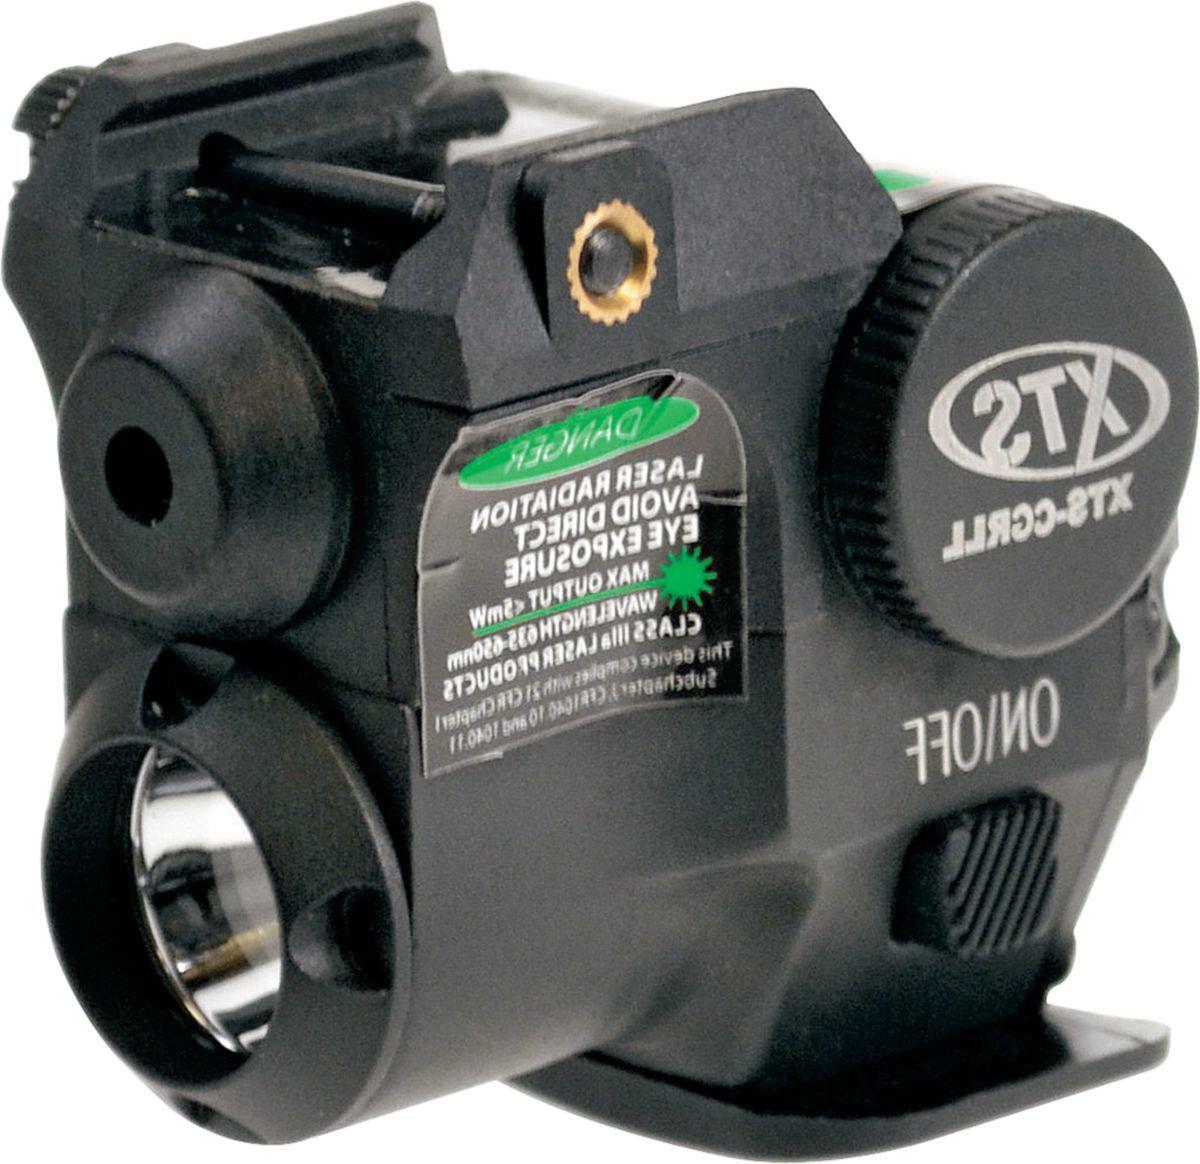 XTS Subcompact Green Pistol Laser and Flashlight Combo